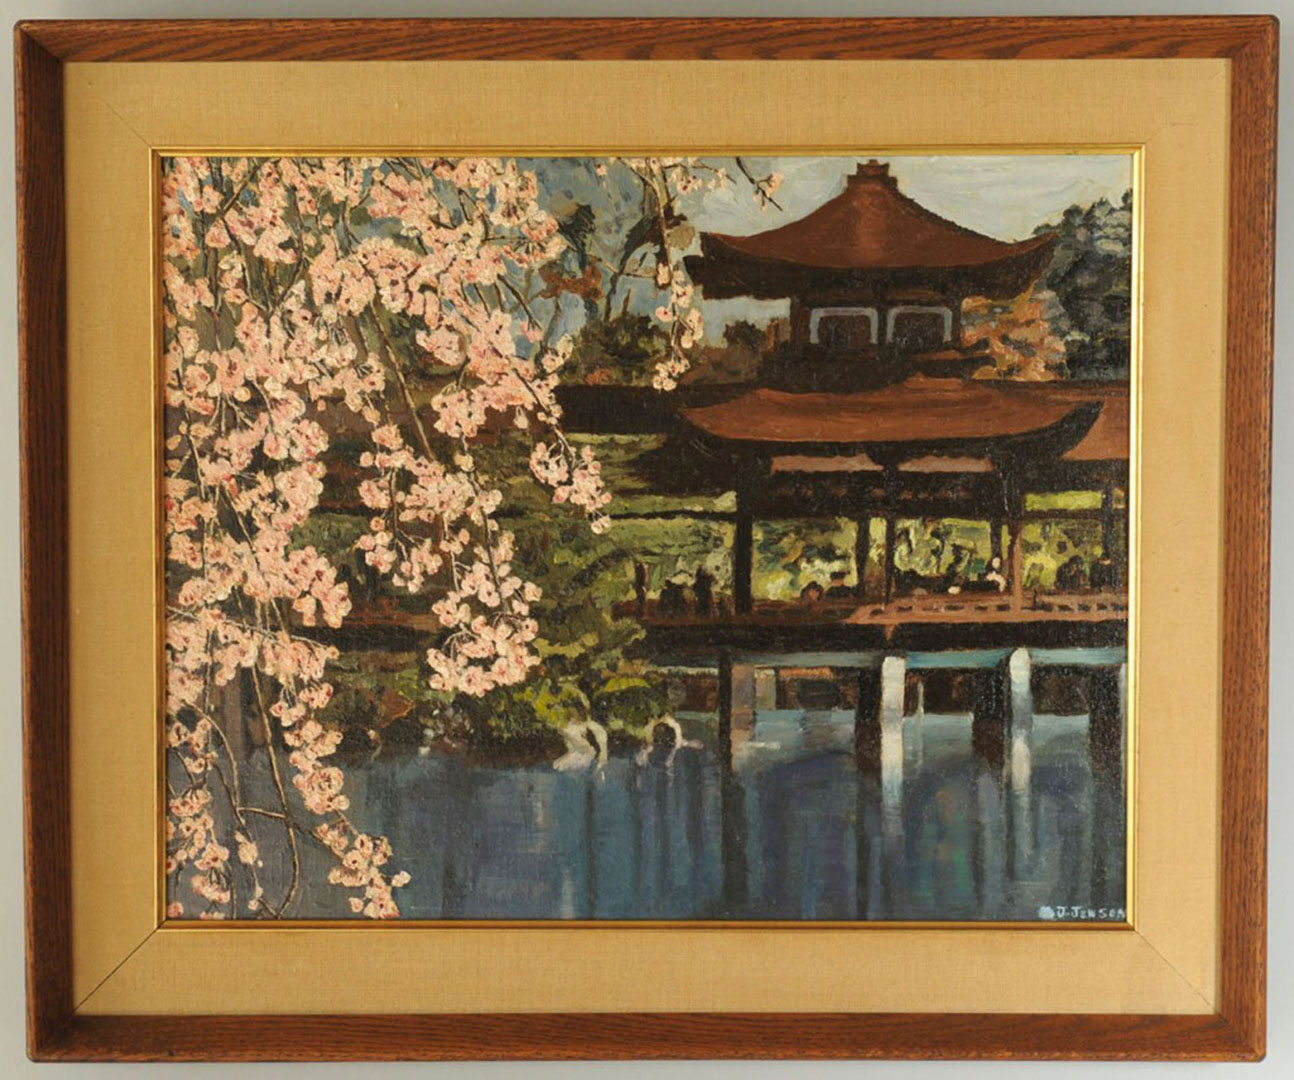 Lot 2872258: Japanese Landscape Oil on Board